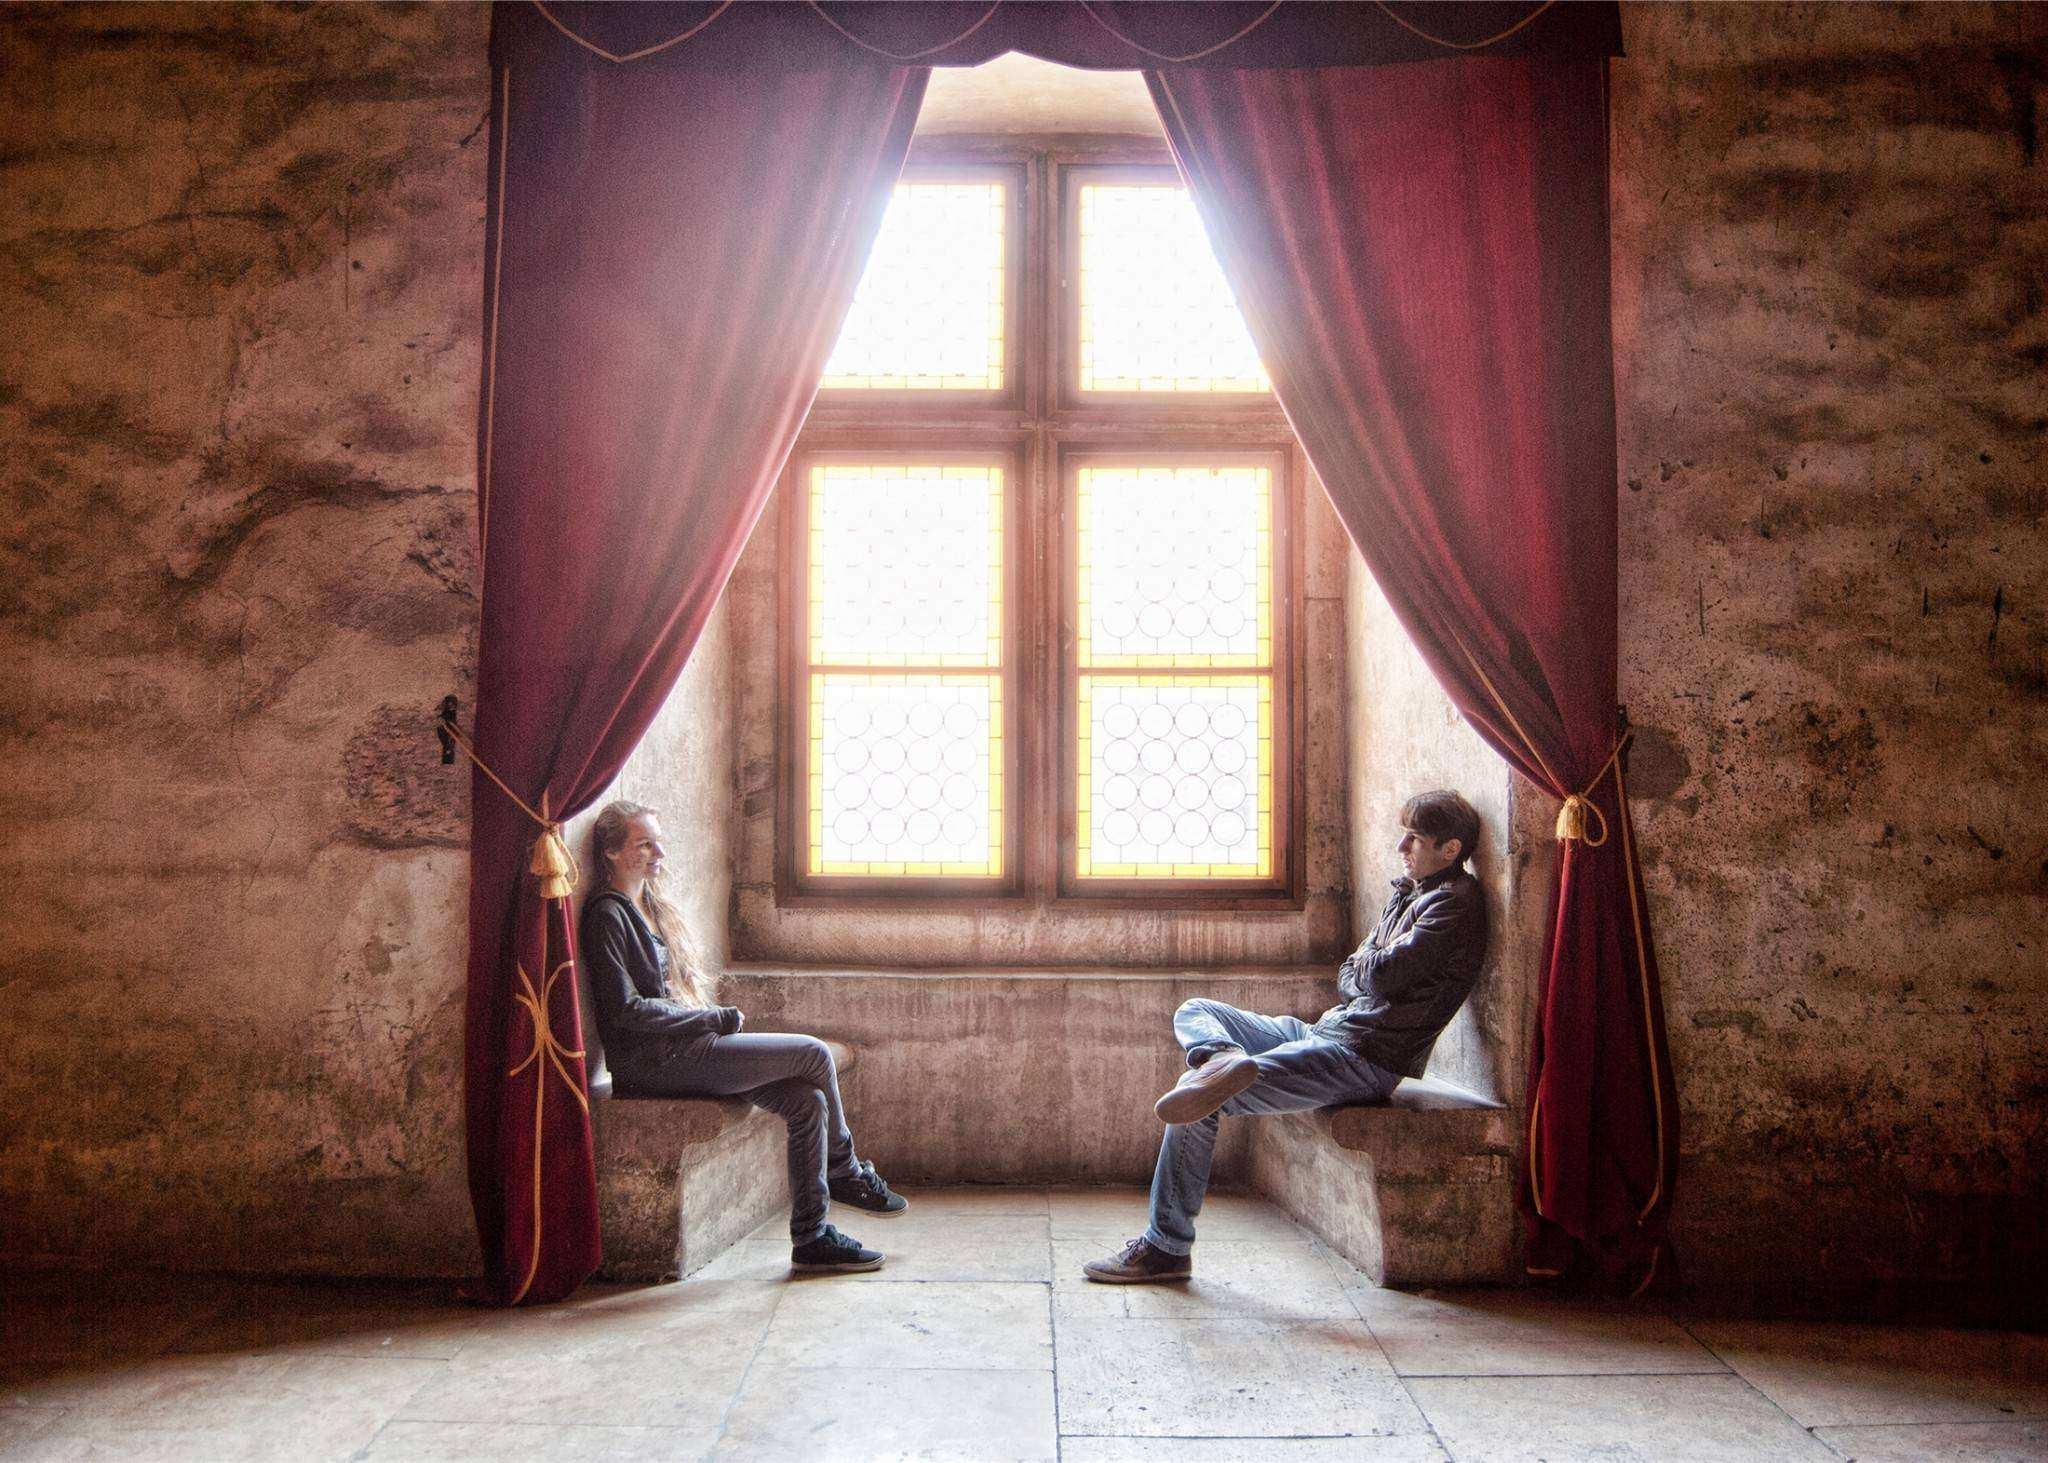 conversation topics